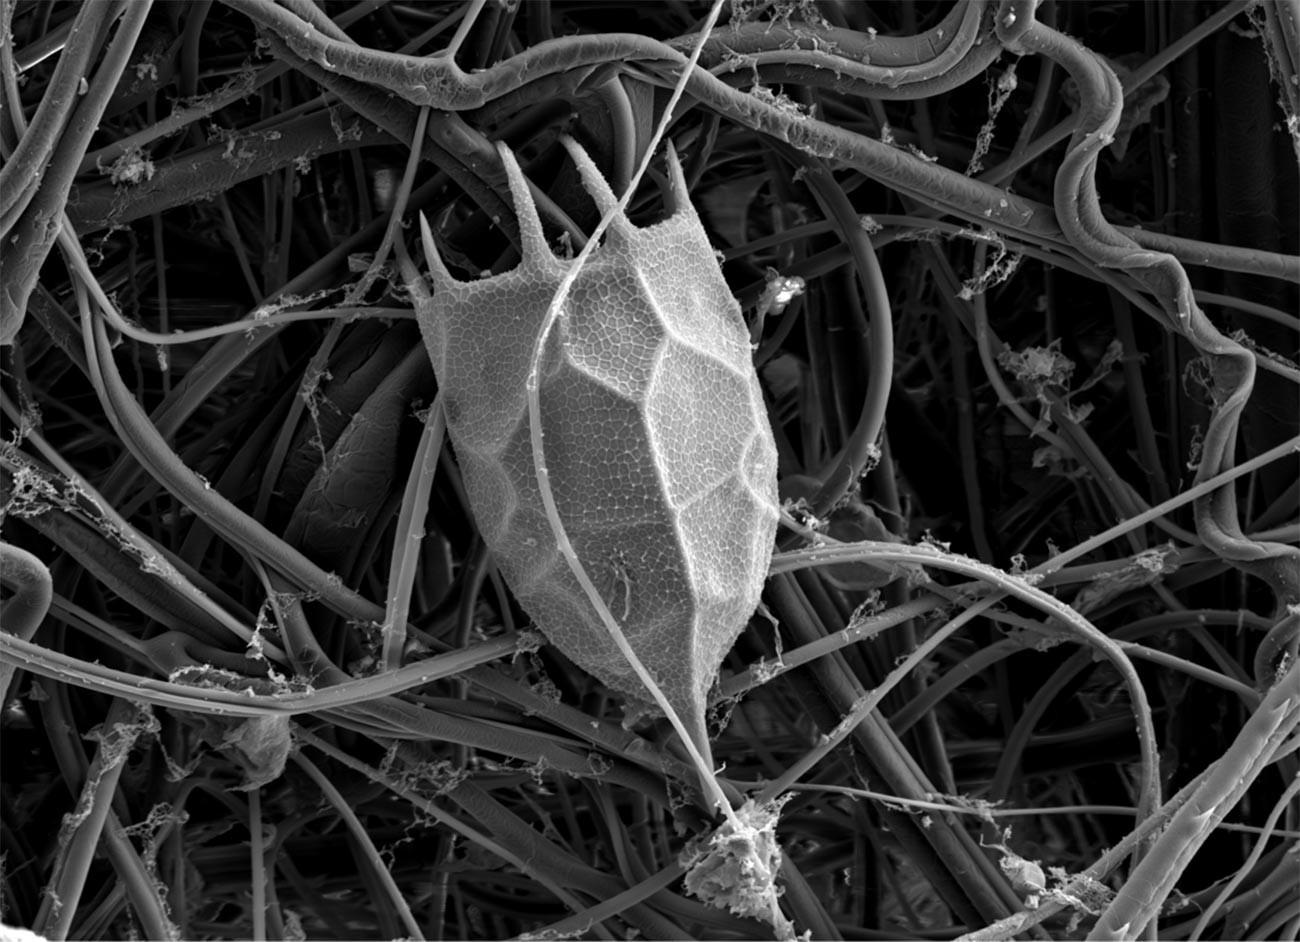 Locula of the rotifer Keratella cochlearis, scanning electron microscope image.